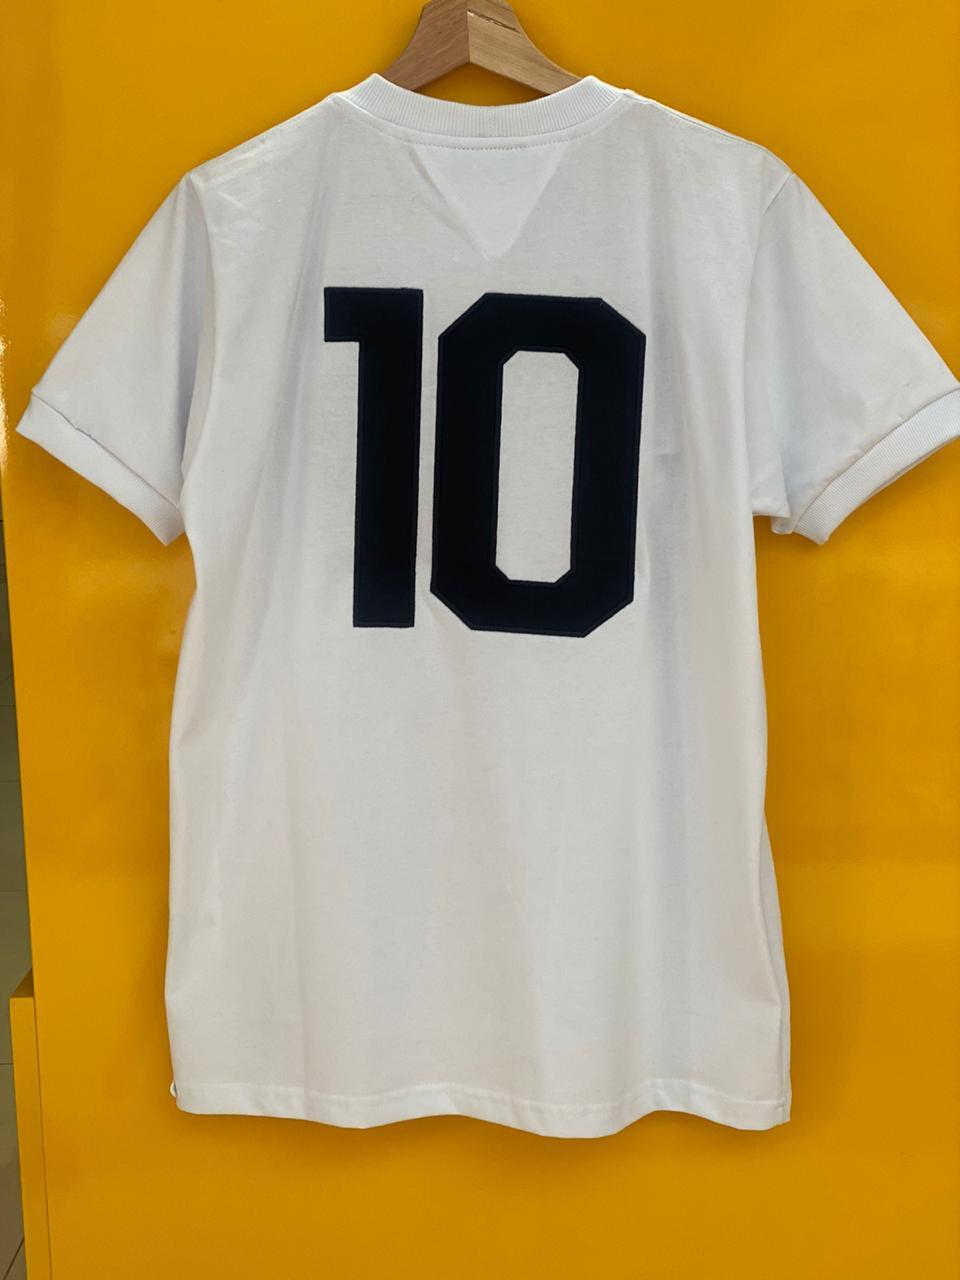 CAMISA SANTOS 1969 - Pele 1.000 Gols